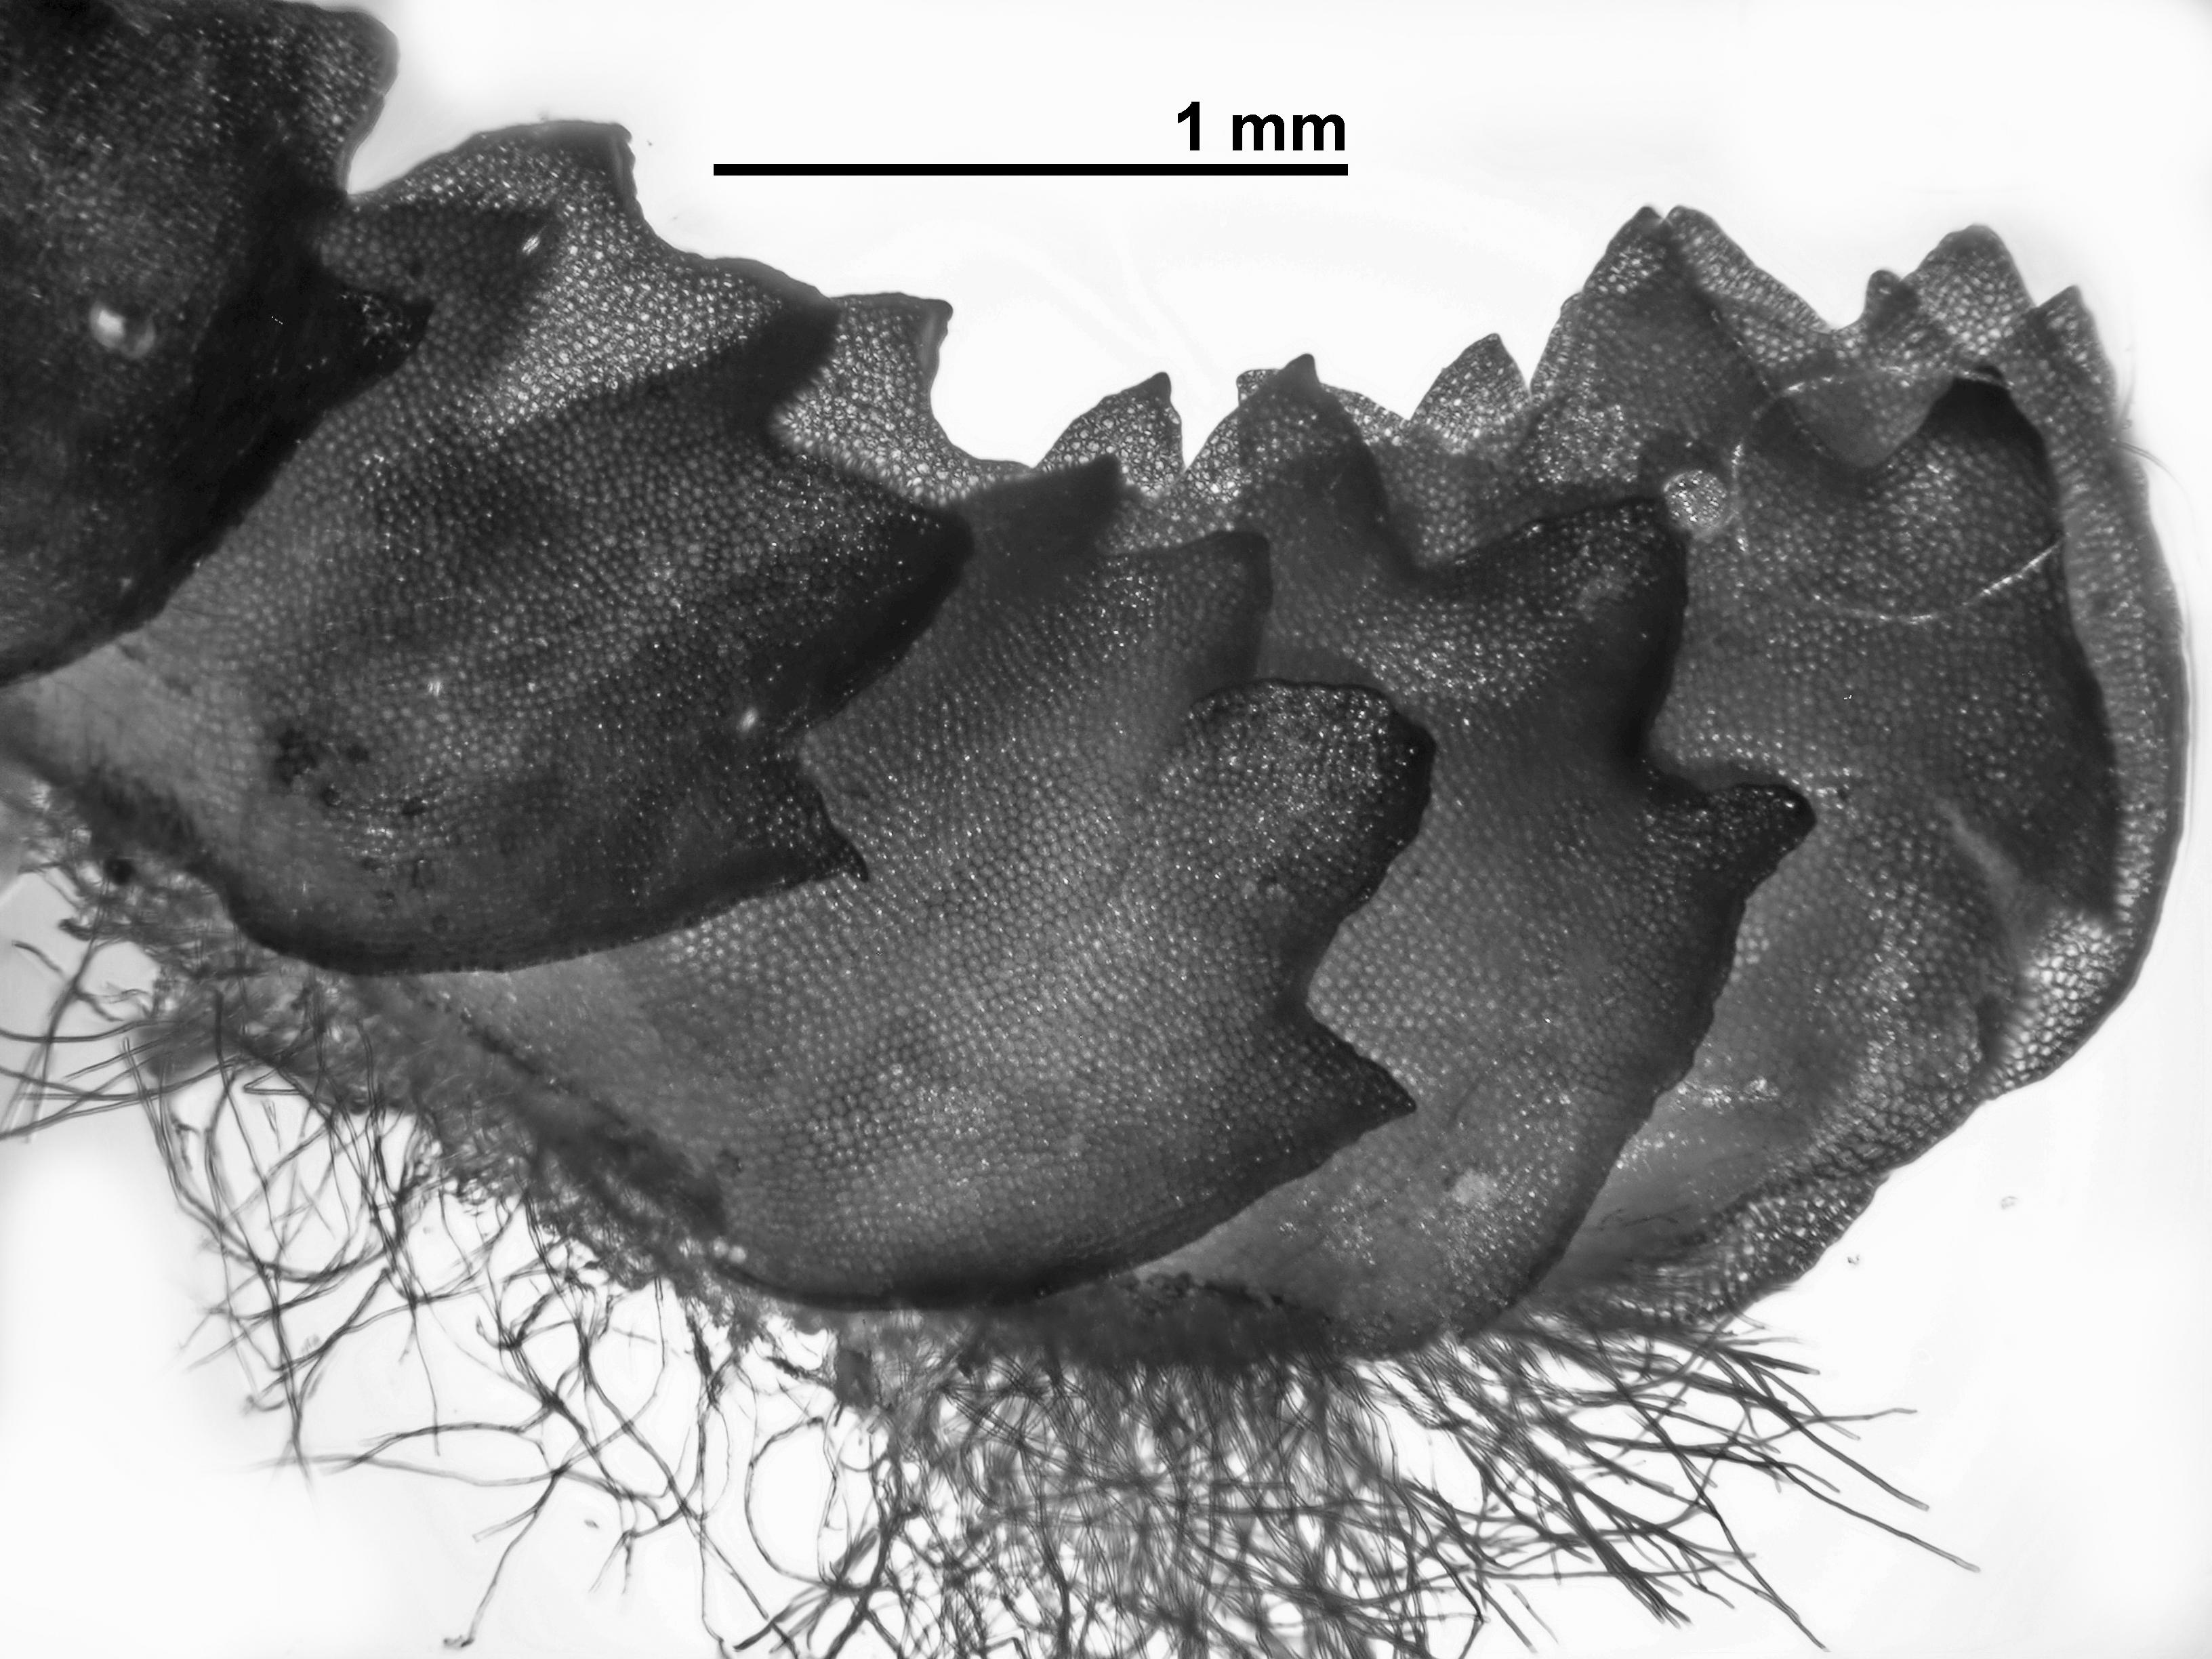 Barbilophozia barbata - shoot side view